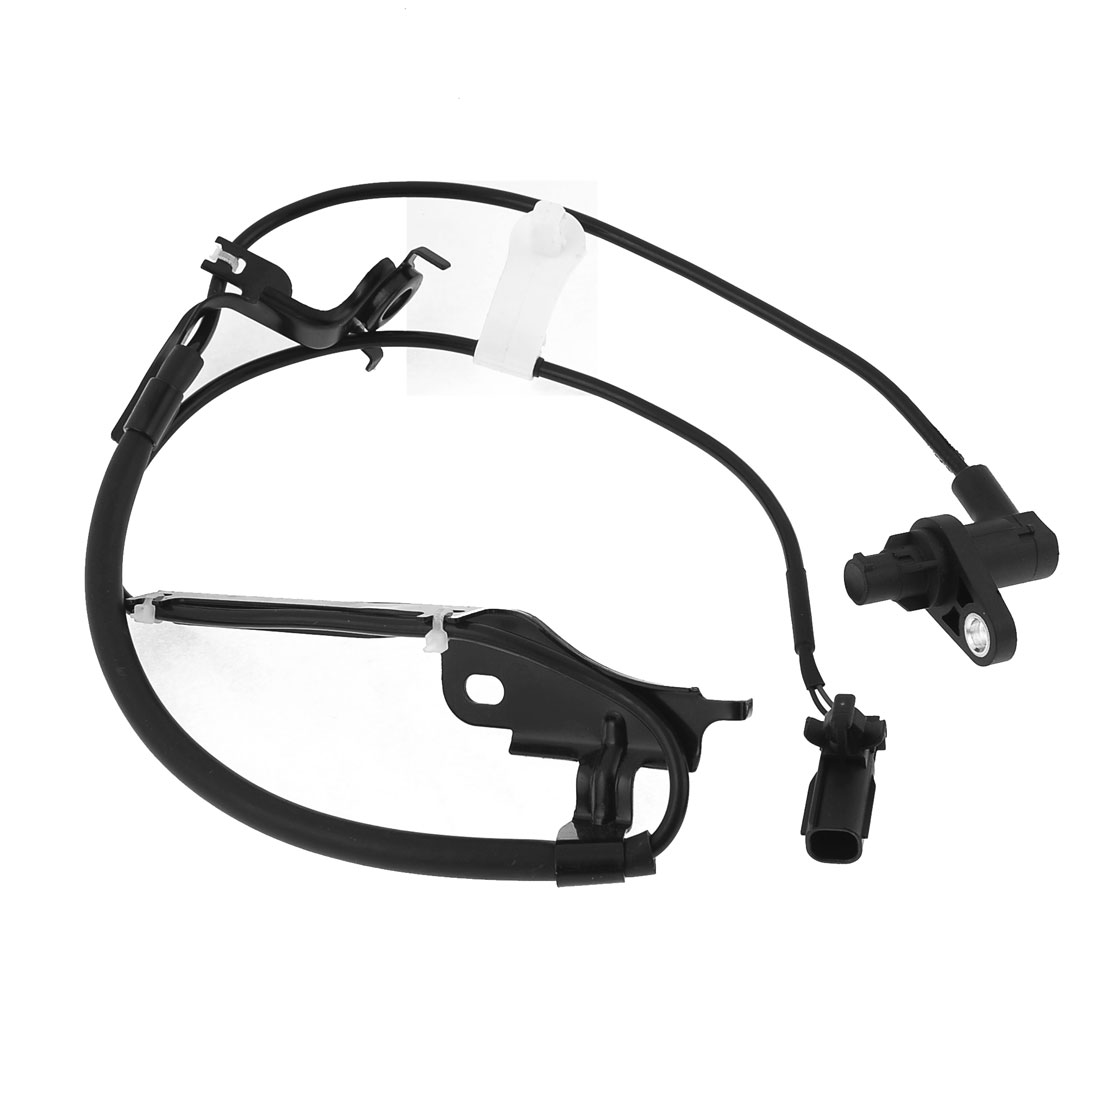 Car Antilock Braking System Sensor Assembly Front Right 89542-48040 for Highlander